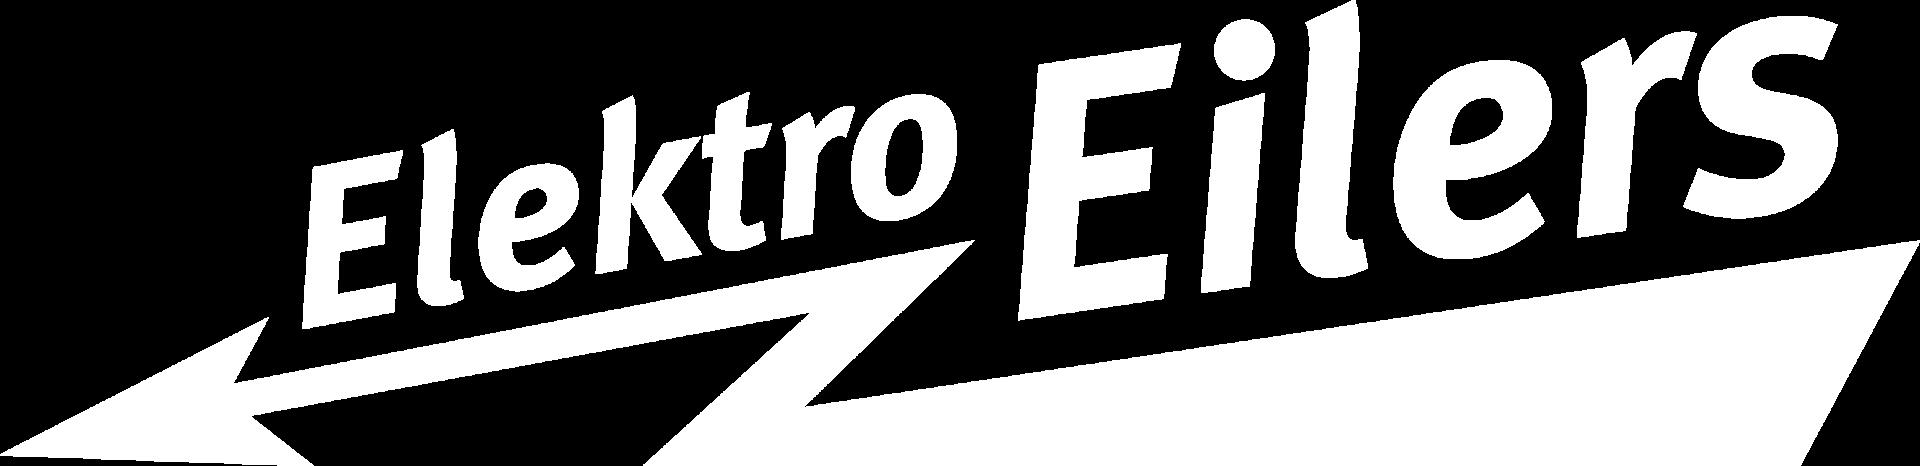 Elektro Eilers